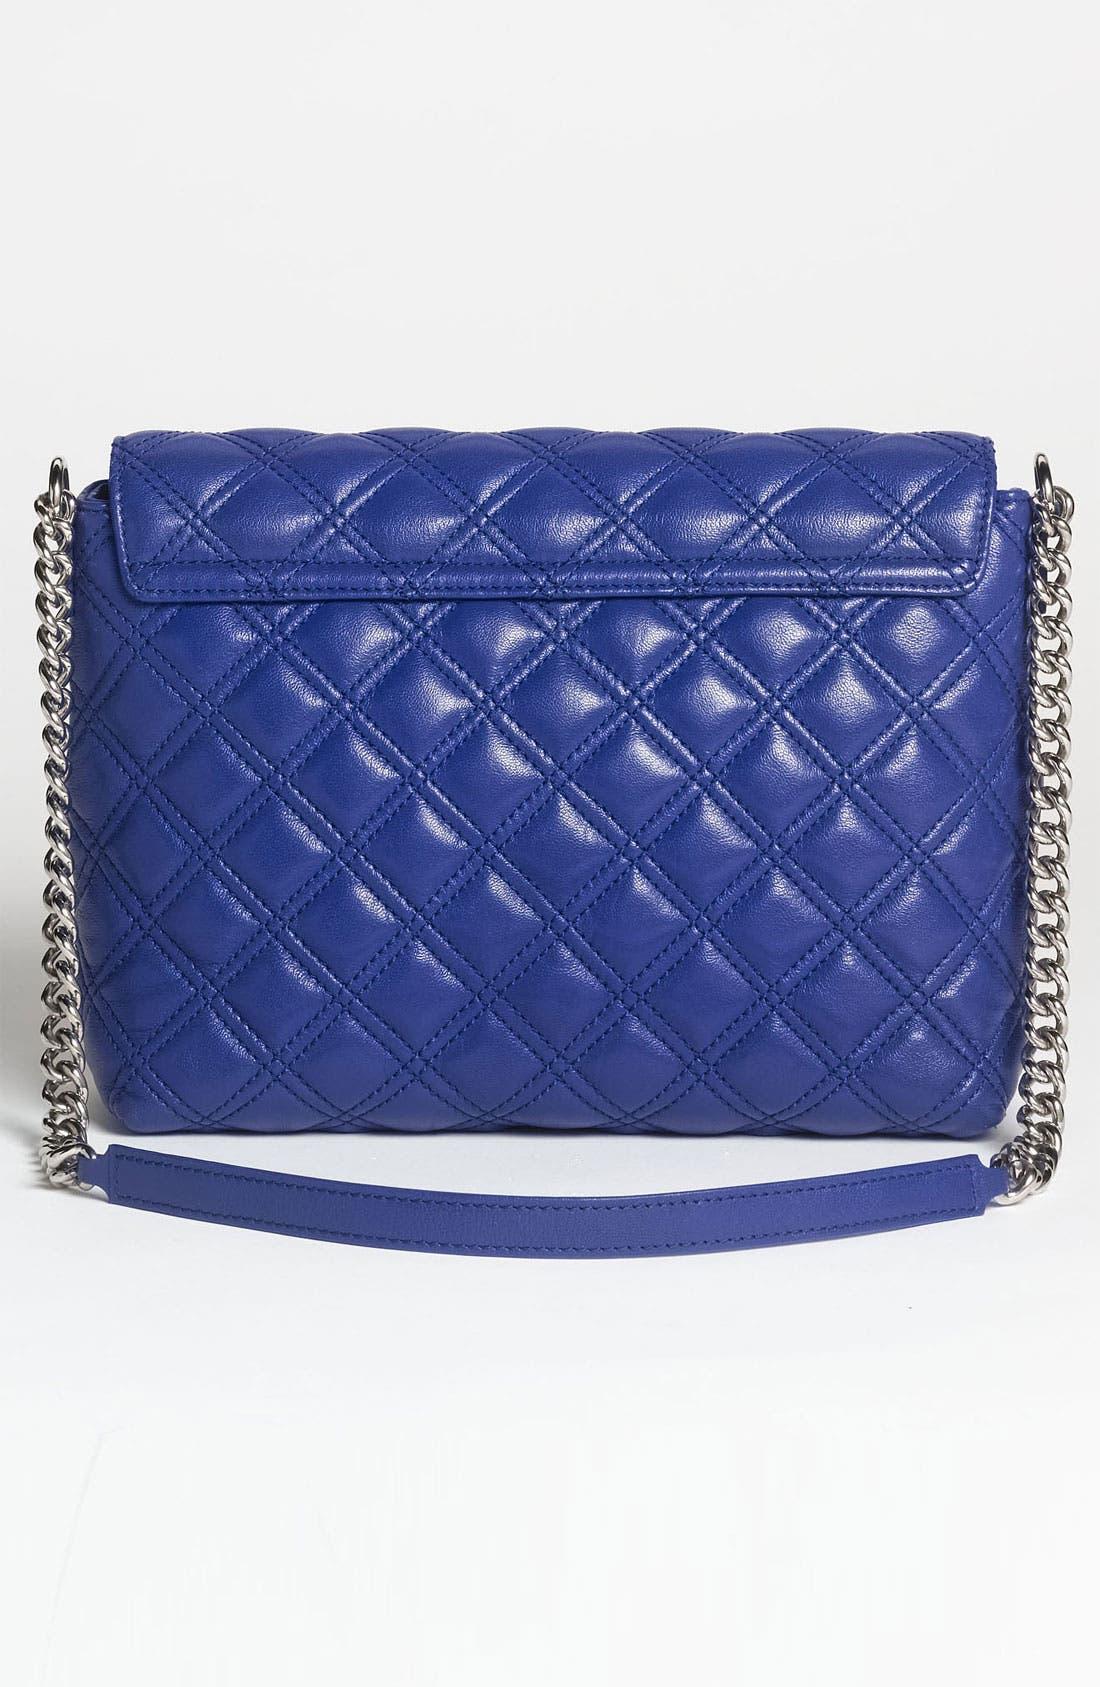 ,                             'Large Quilting Single' Leather Shoulder Bag,                             Alternate thumbnail 32, color,                             430